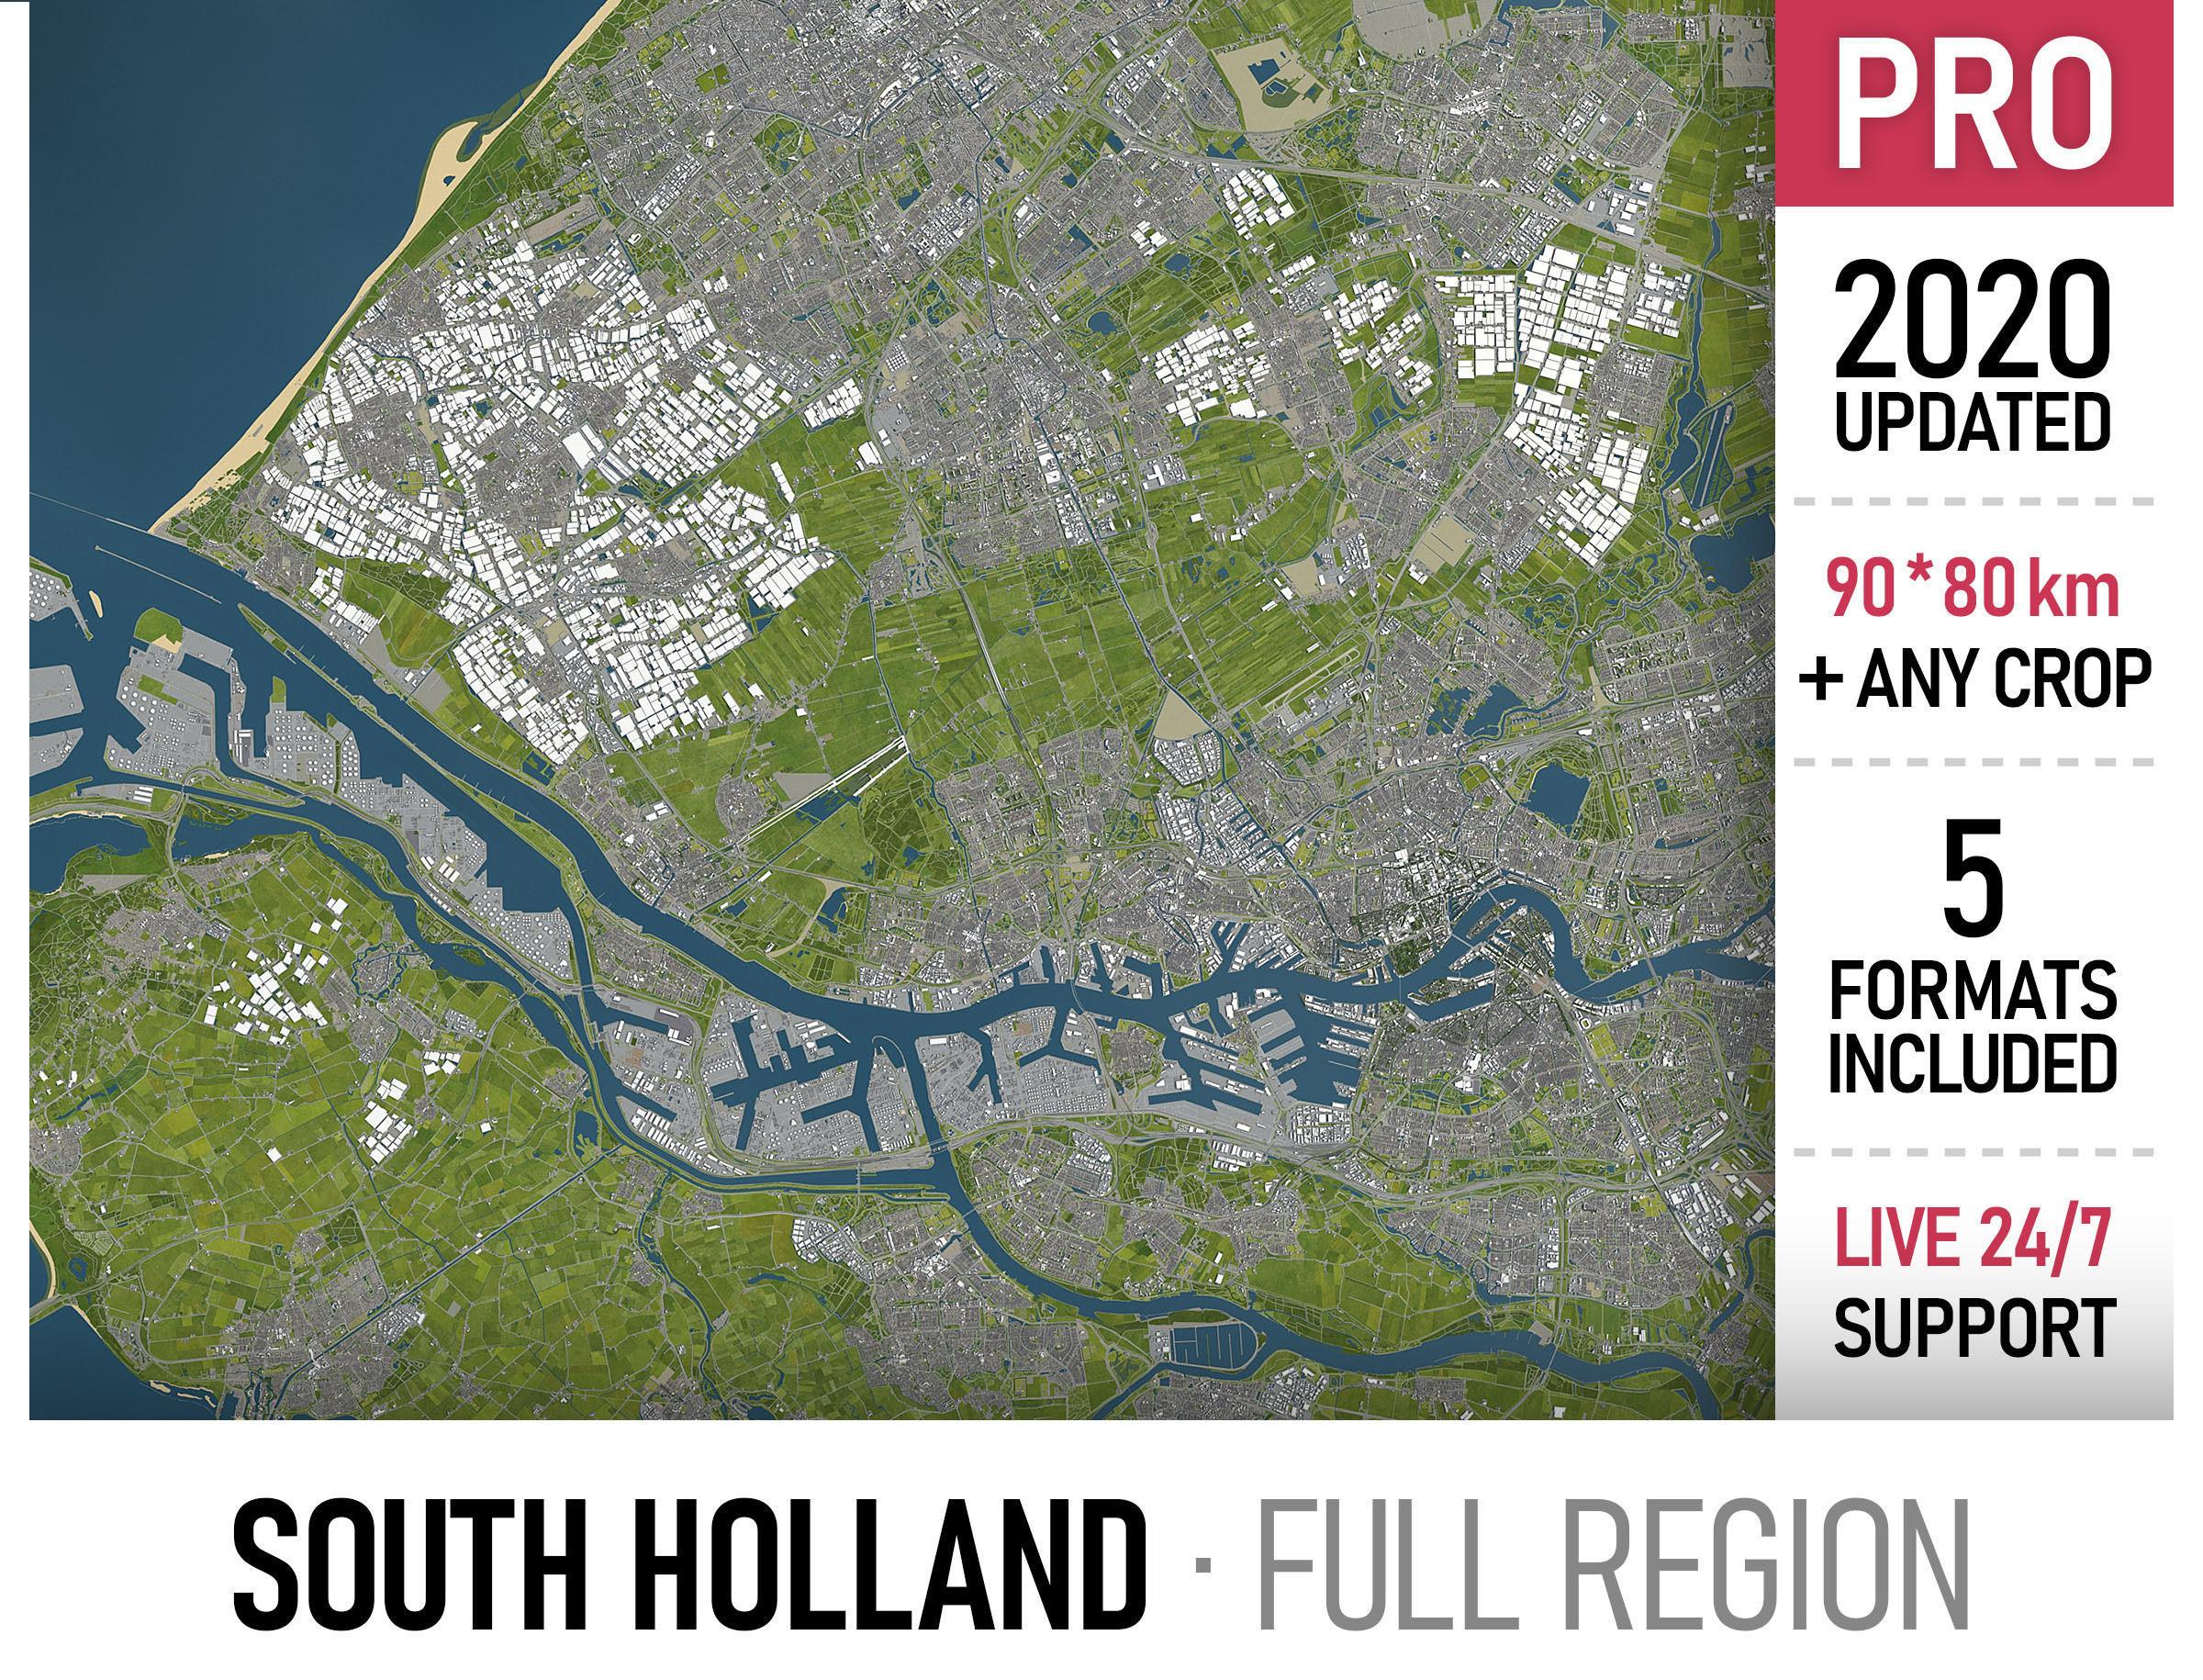 South Holland - full region